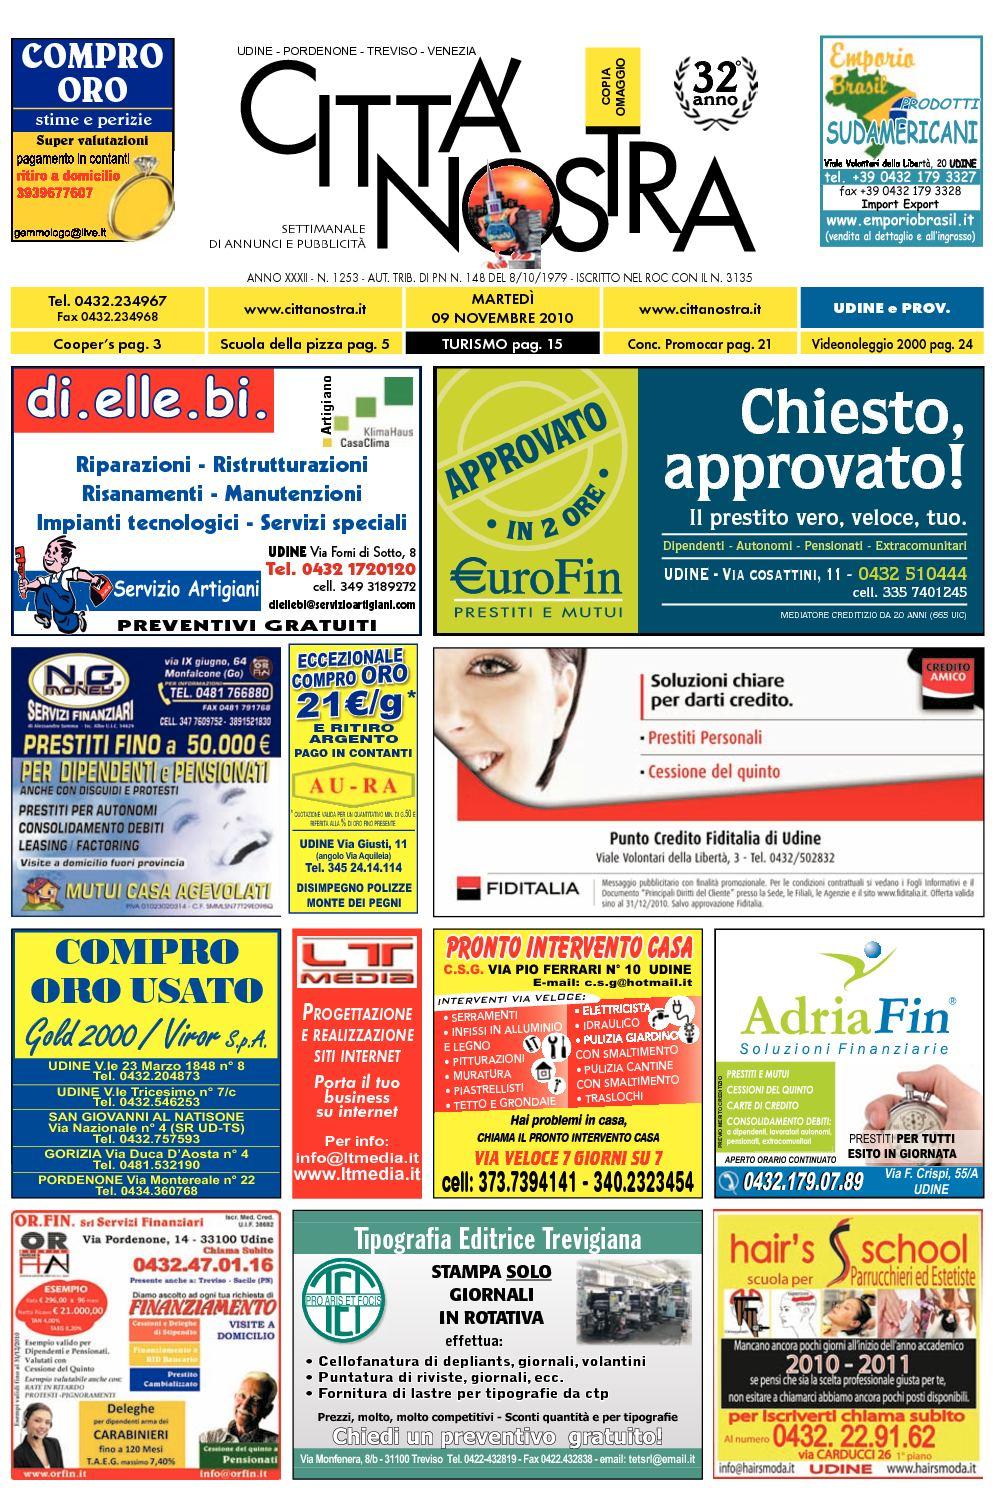 Calaméo Citt Nostra Udine Del 09 11 2010 N 1253